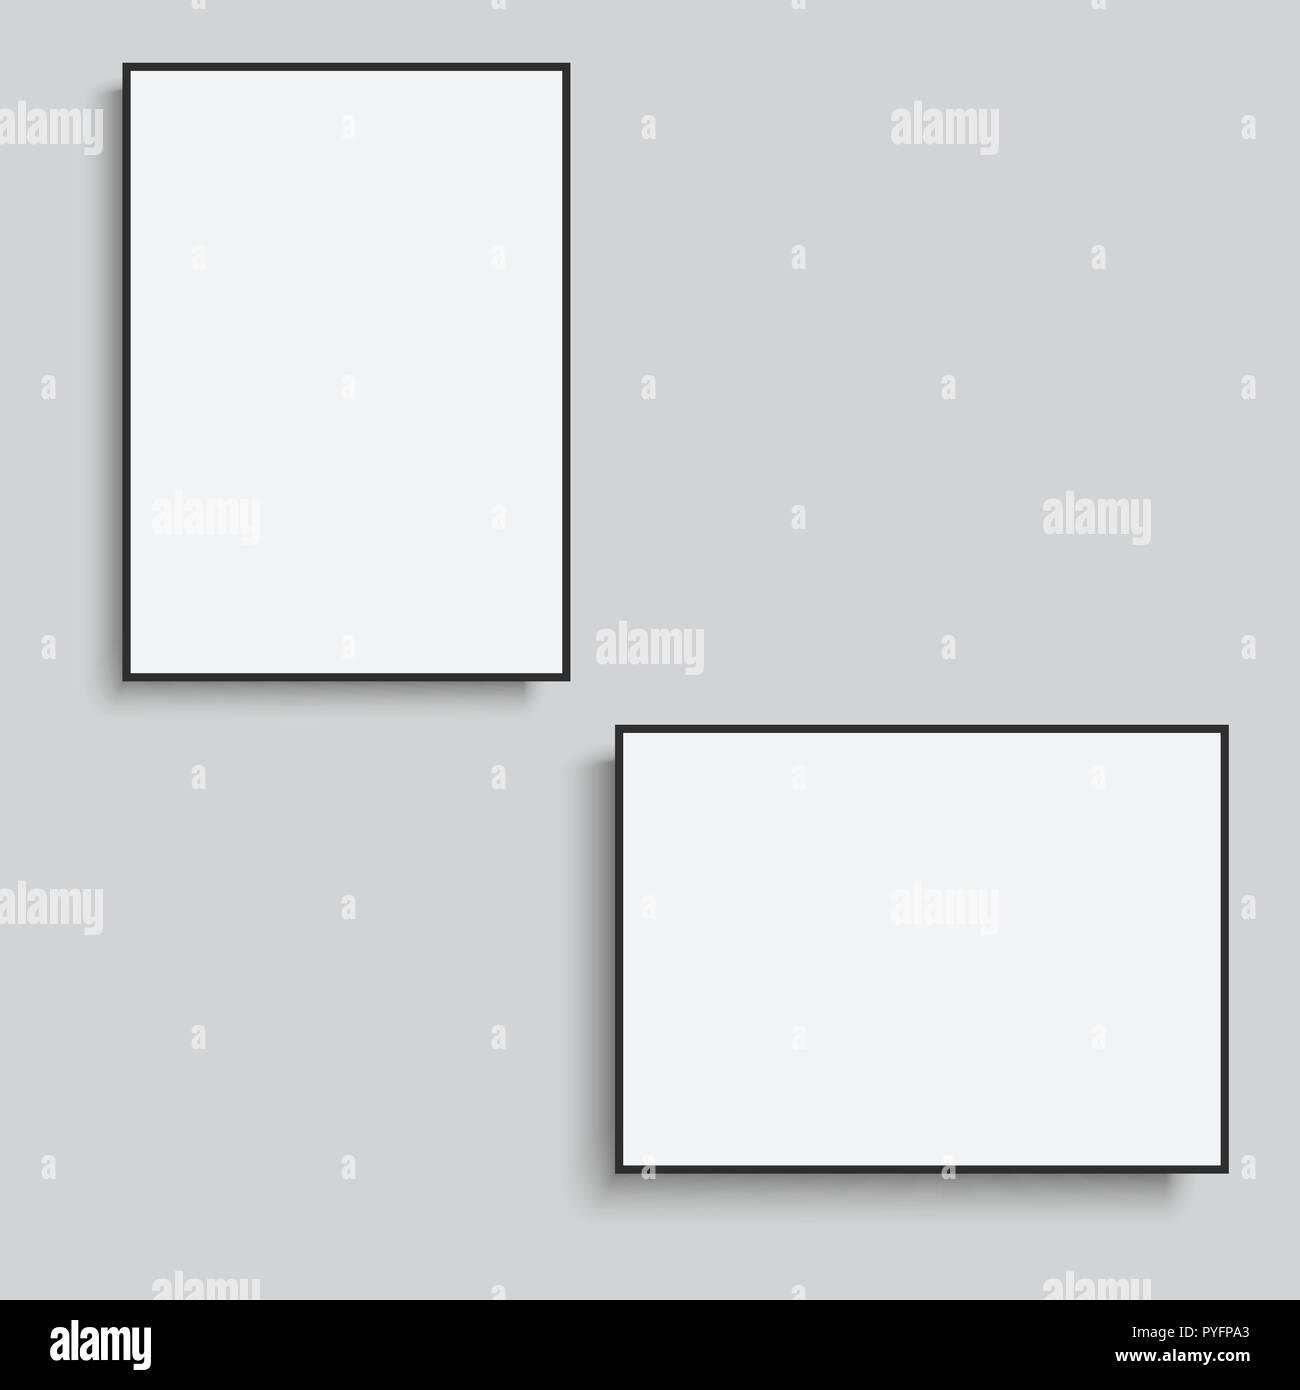 White Horizontal And Vertical Frames Vector Stock Vector Art